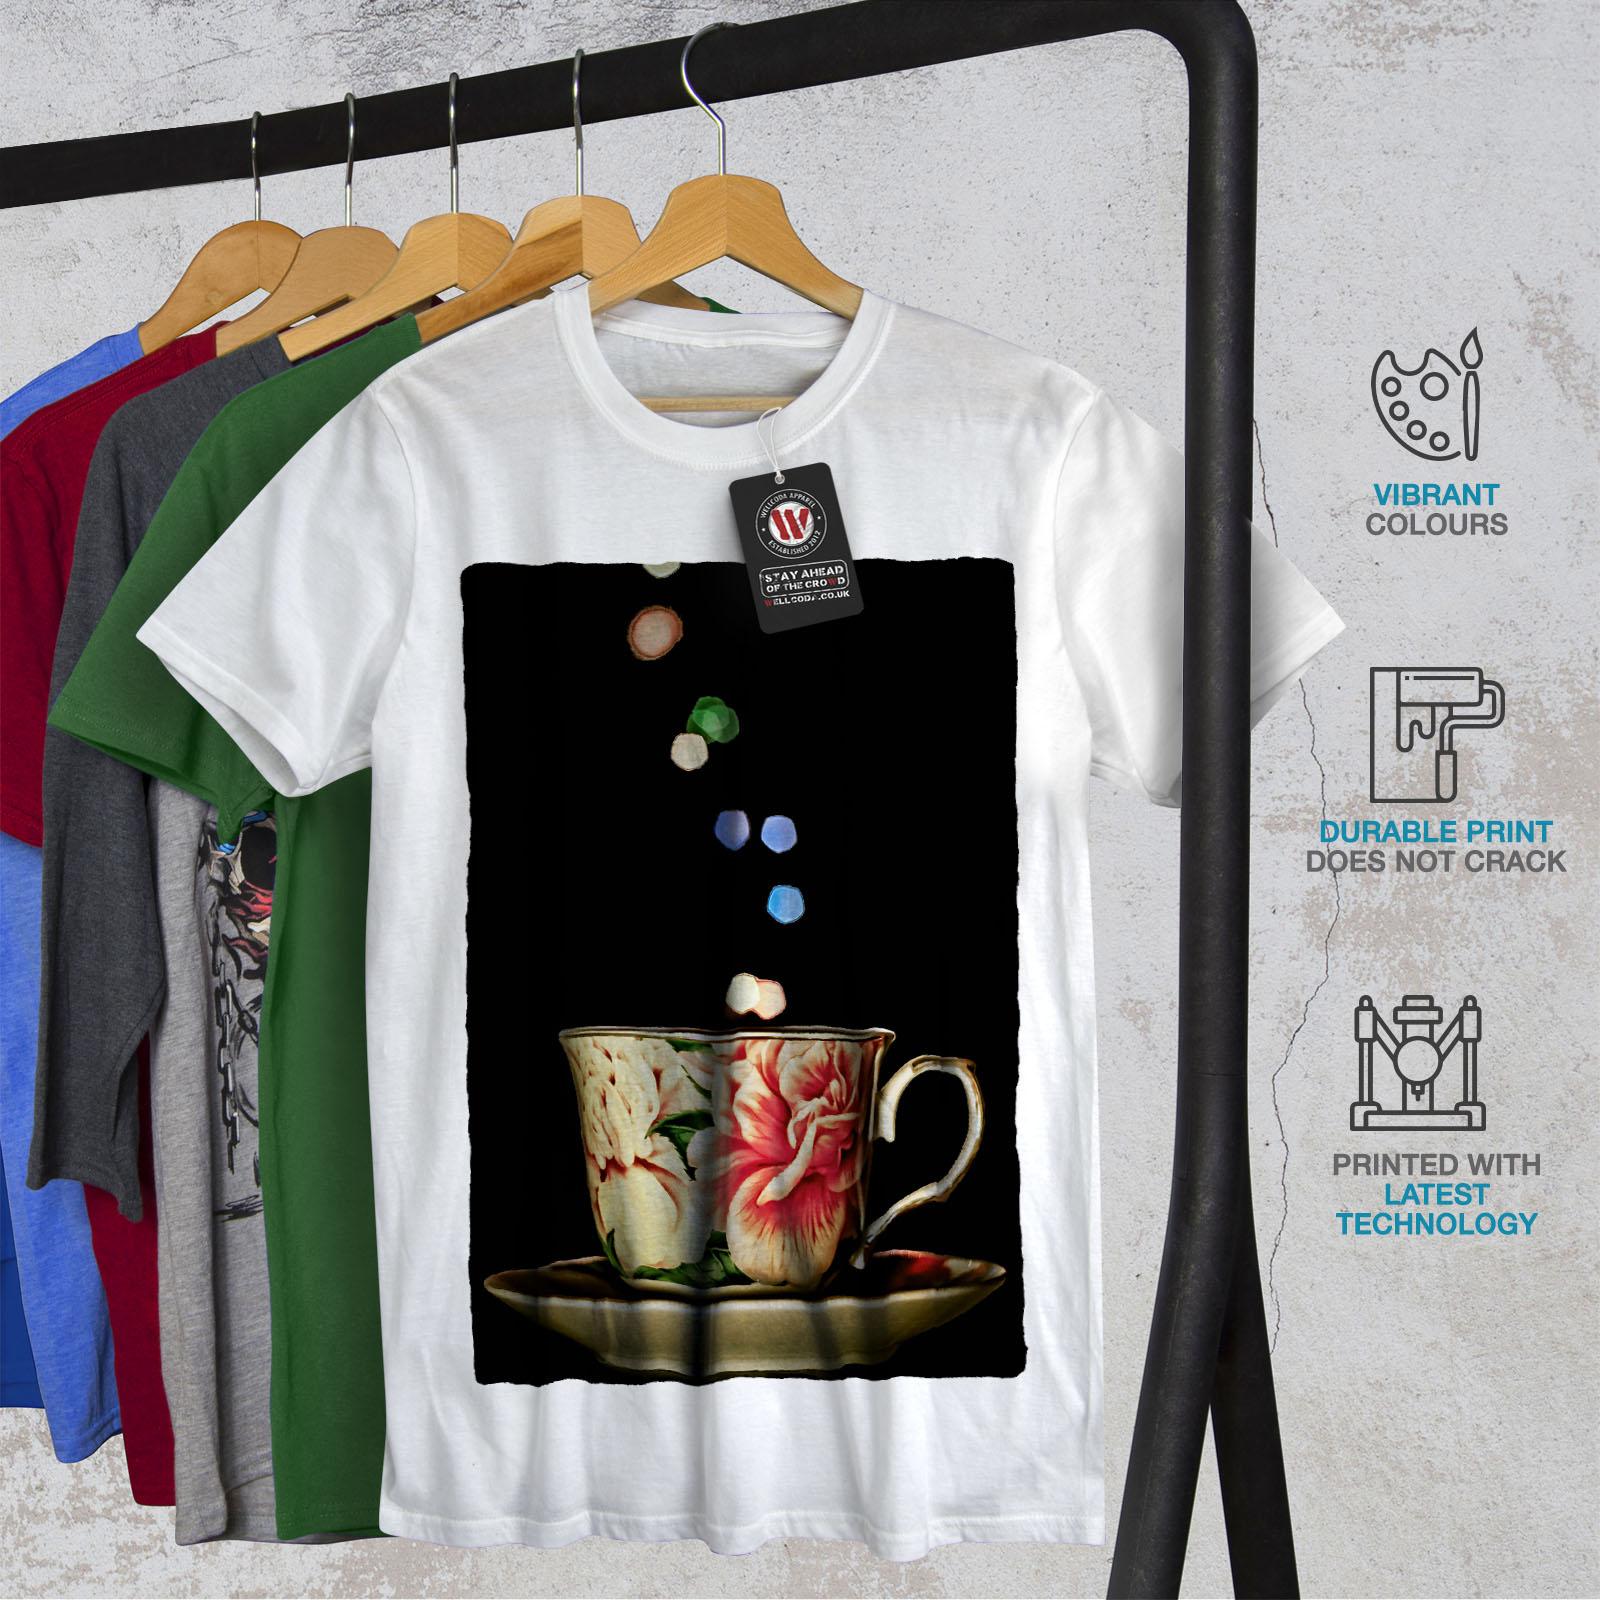 Wellcoda-Tea-Cup-Retro-Old-Mens-T-shirt-Smell-Graphic-Design-Printed-Tee thumbnail 12